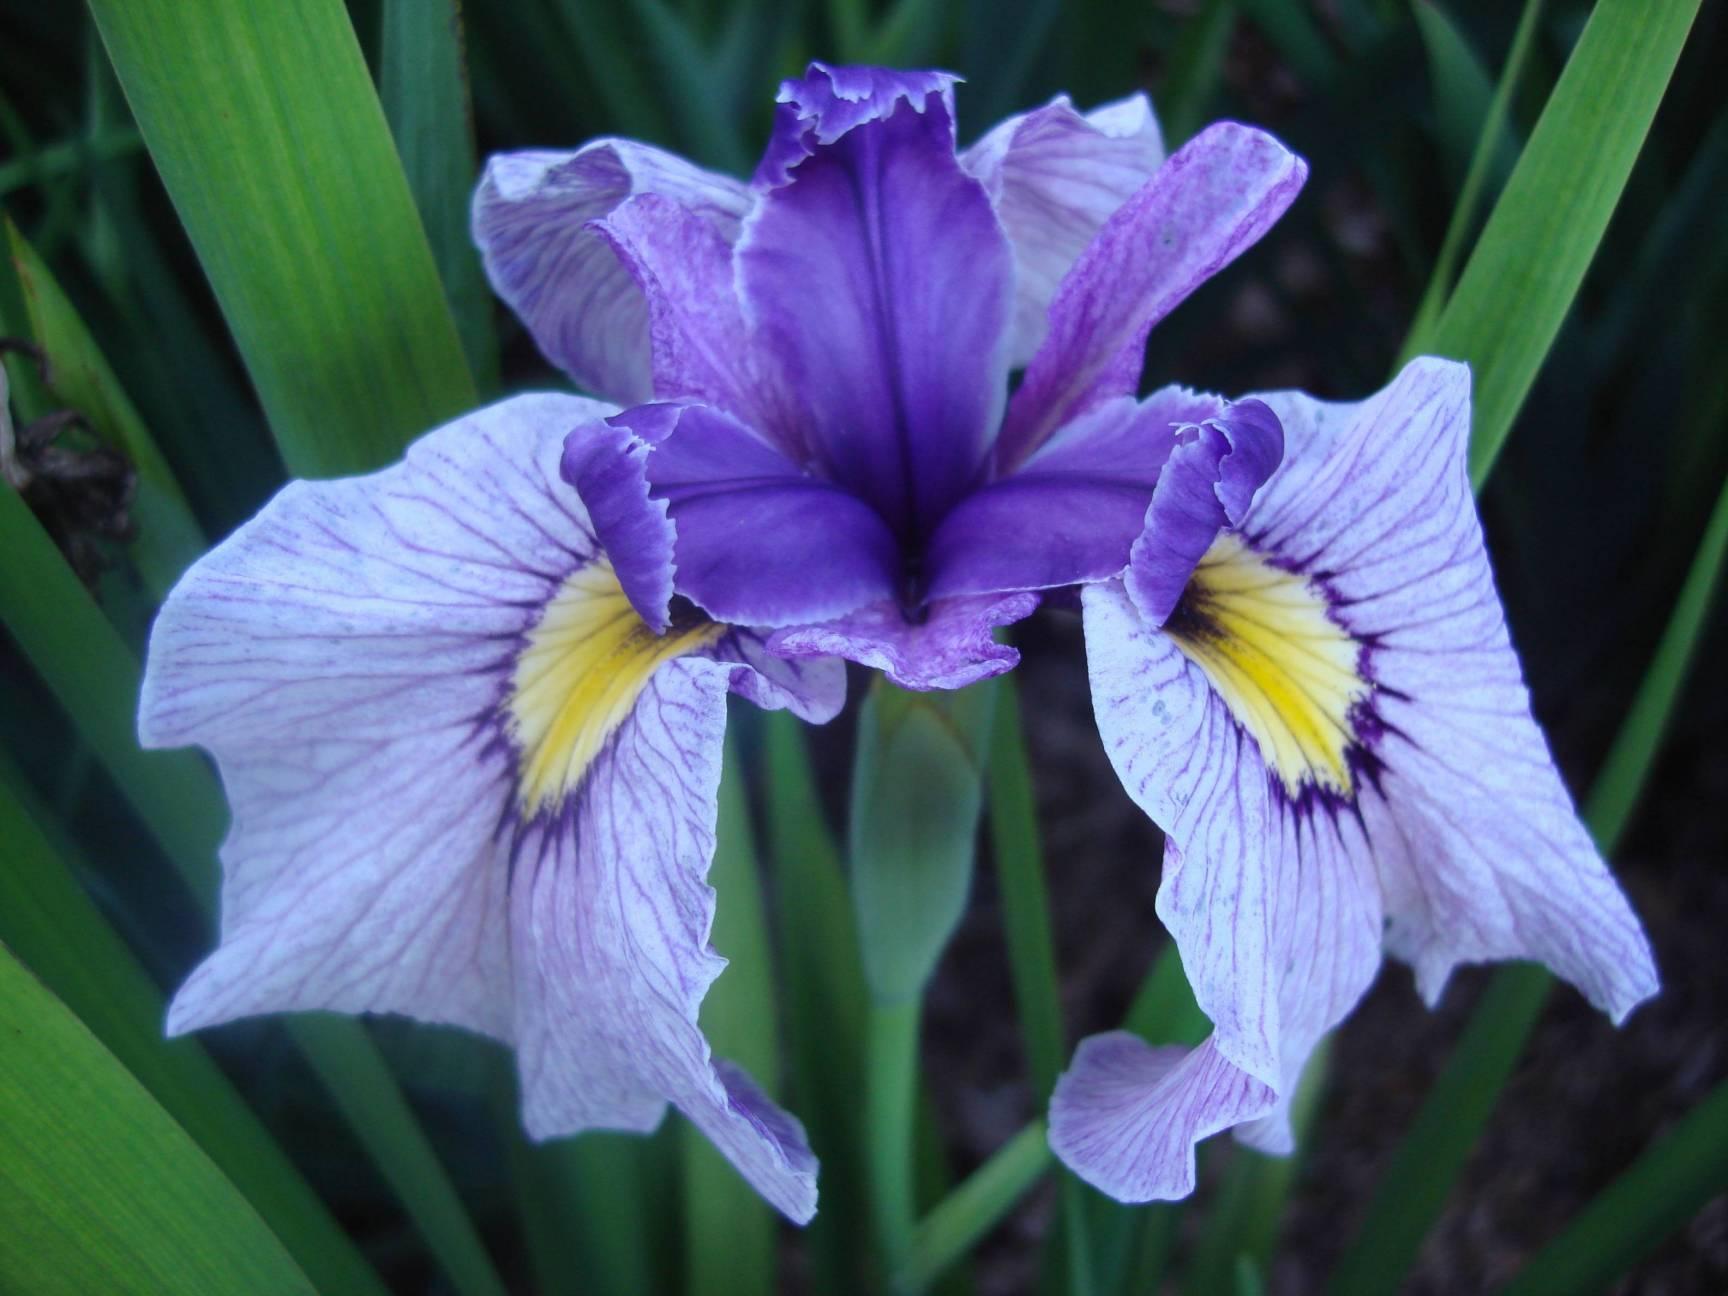 Draycott gardens beardless irises from carol warner m izmirmasajfo